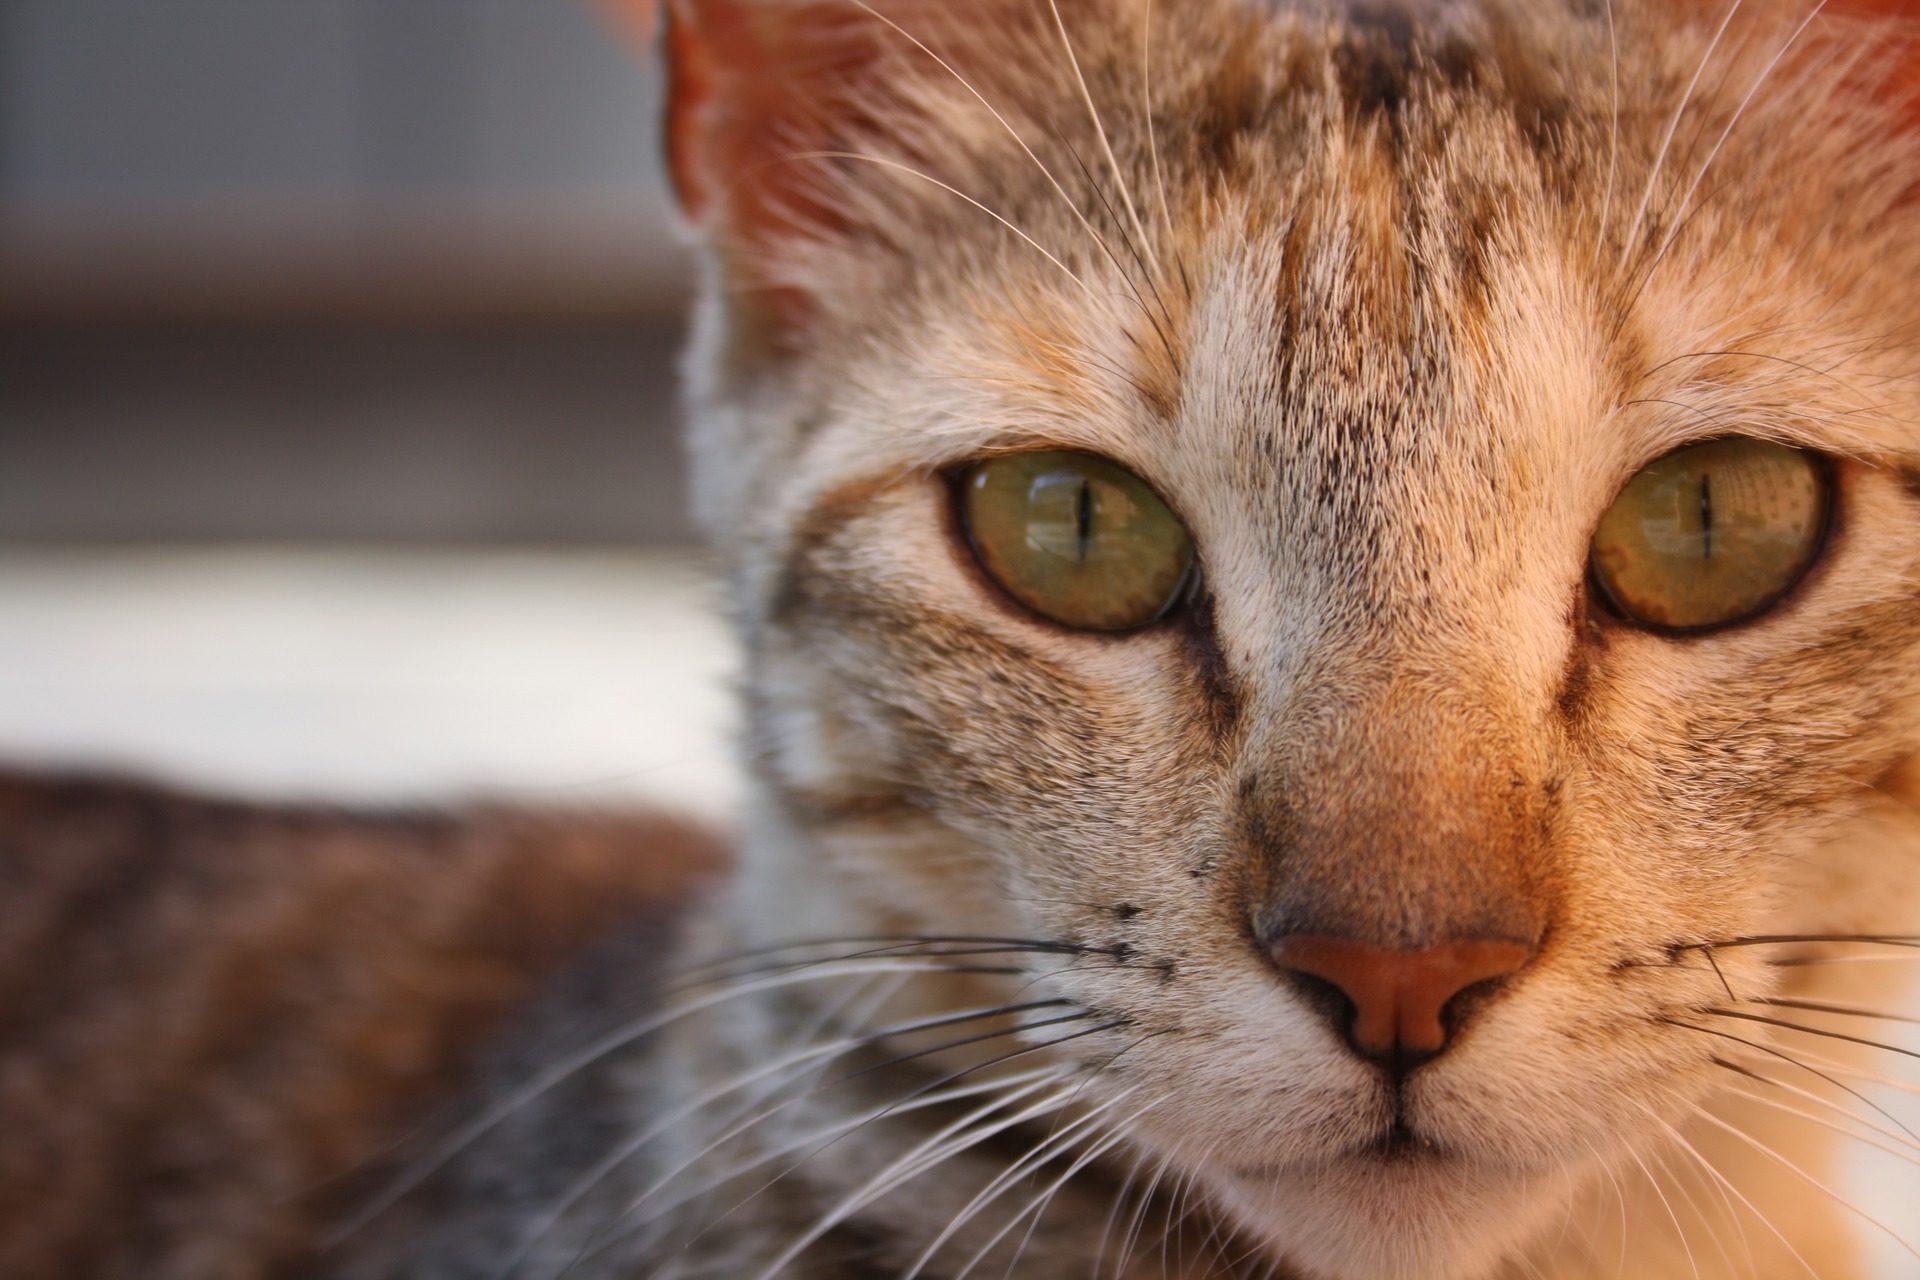 gato, felino, mascota, ,mirada, ojos, bigotes, de cerca - Fondos de Pantalla HD - professor-falken.com